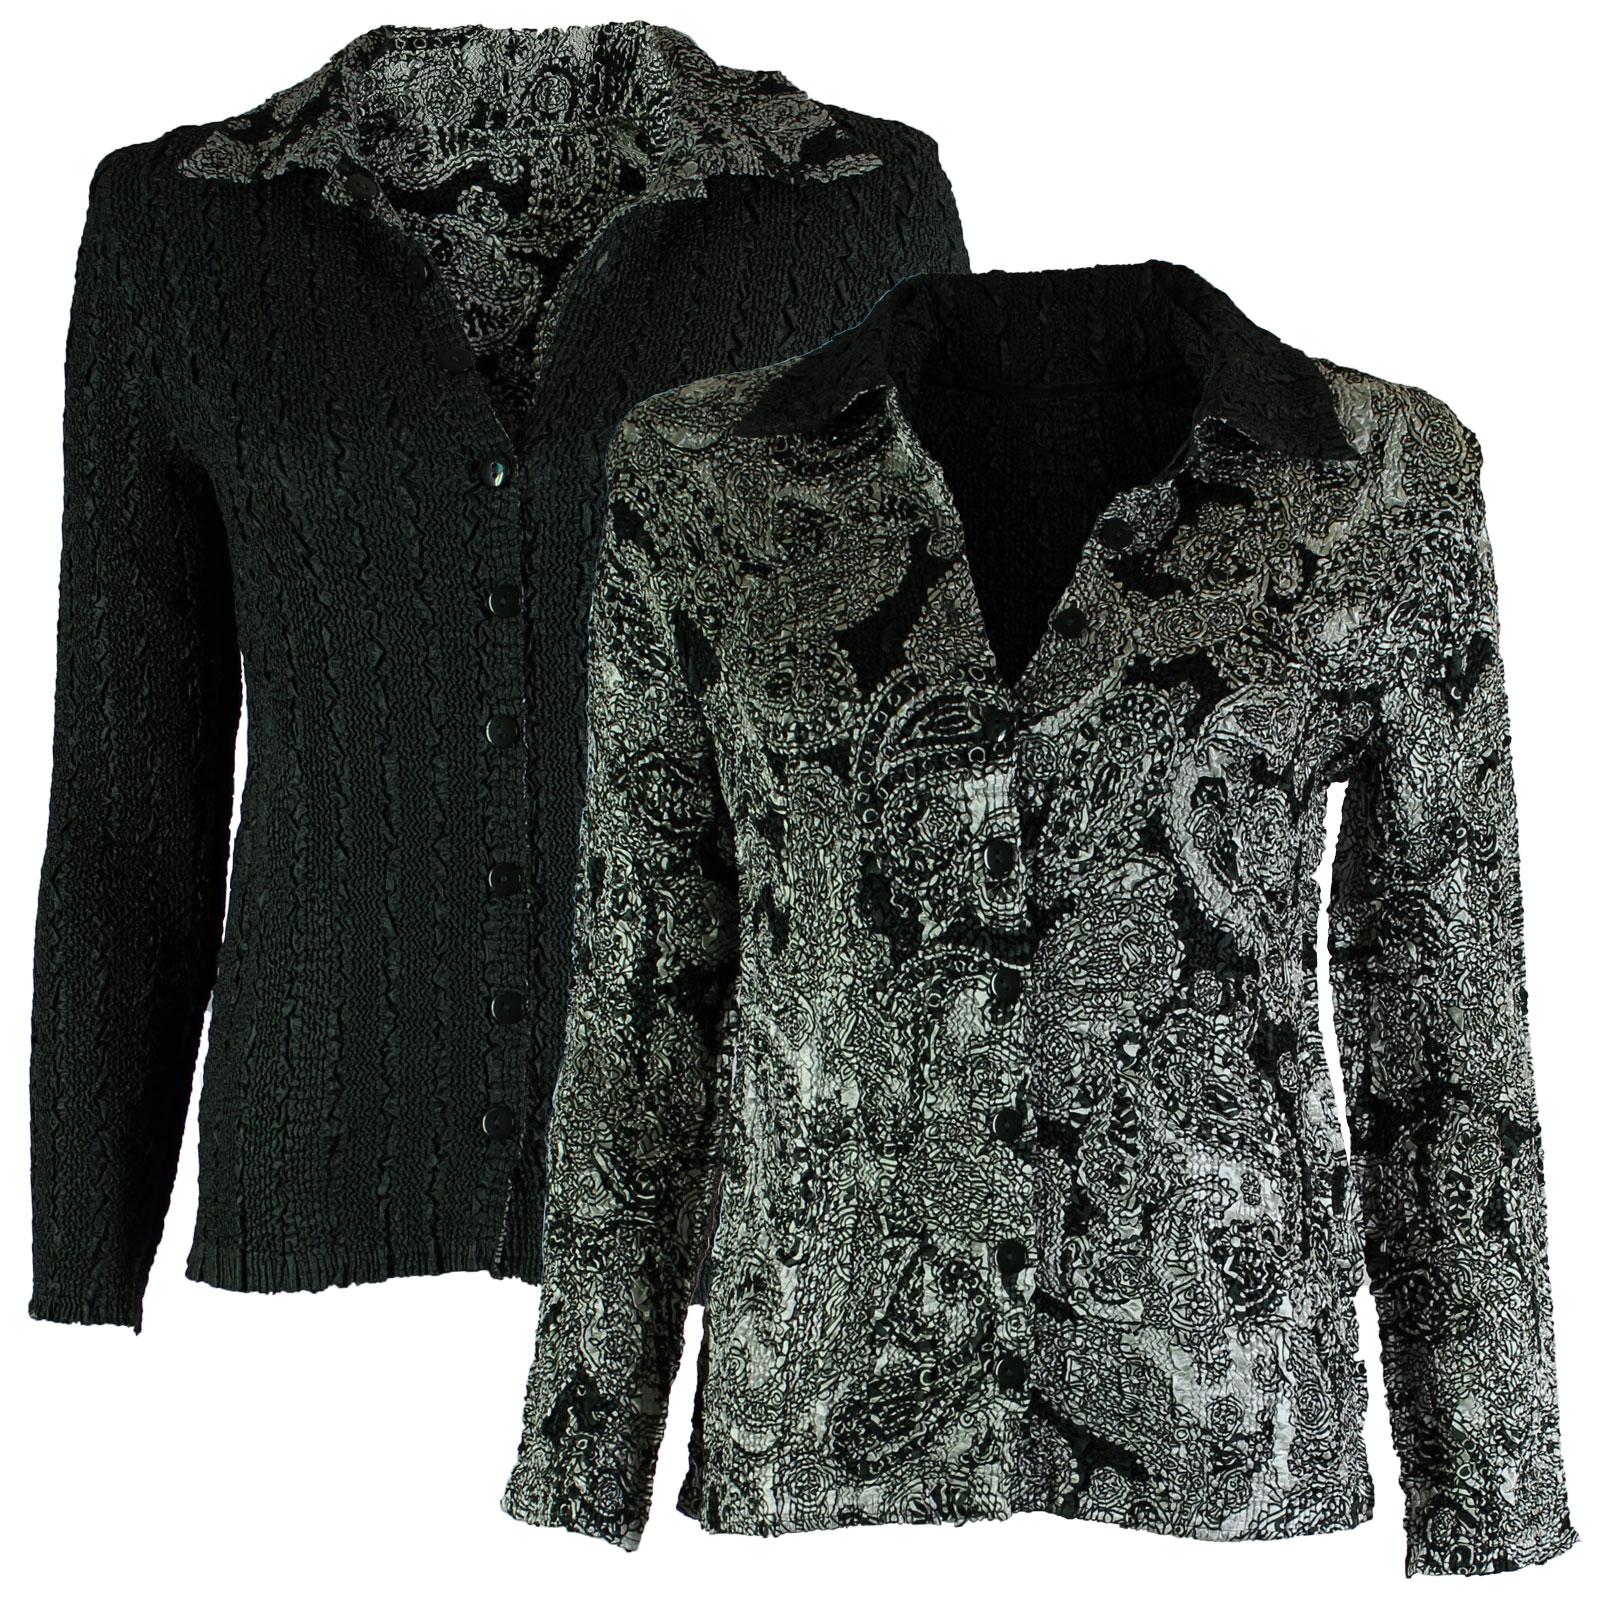 Wholesale Magic Crush - Reversible Jackets #14020 - L-XL